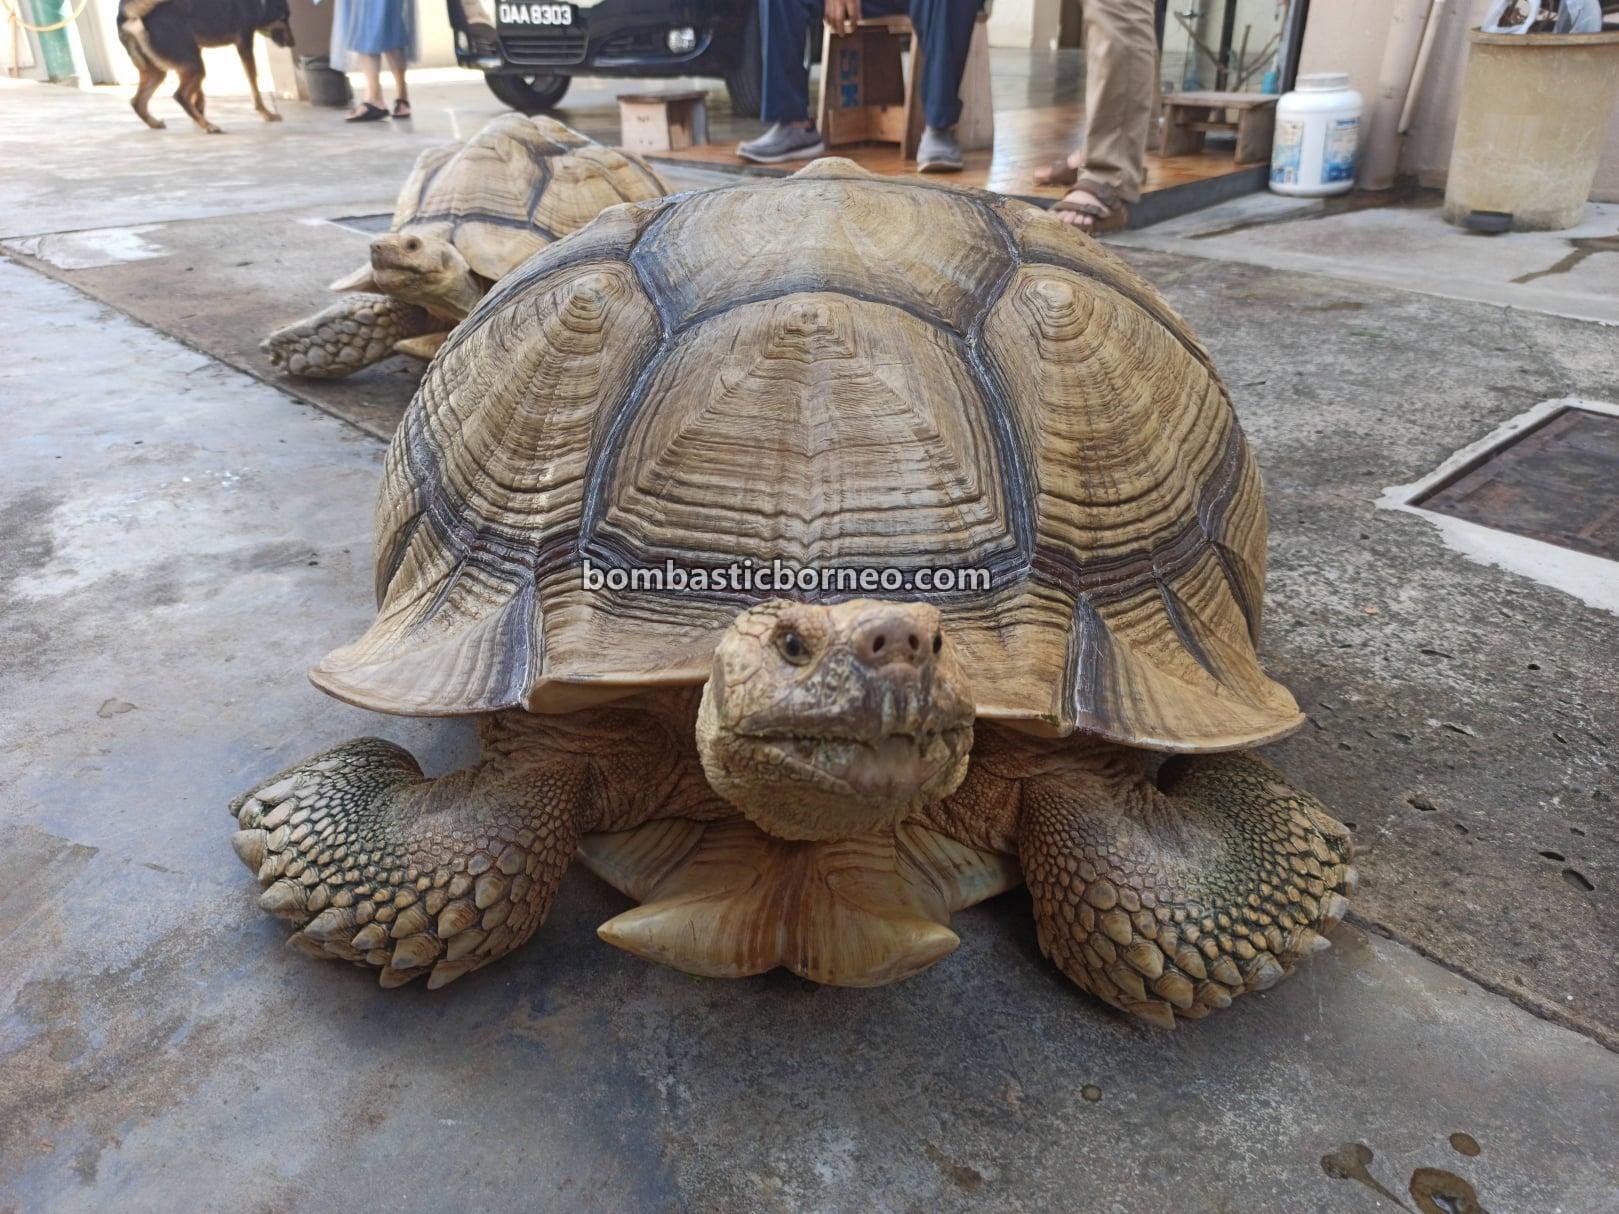 African spurred tortoise, Centrochelys sulcata, Sulcata tortoise, Kura-kura, Haiwan Peliharaan Eksotik, Exotic Animal, pets shop, hobby, Kho Animal Enterprise, Kuching, Sarawak, Malaysia, Tourism, tourist attraction, travel guide